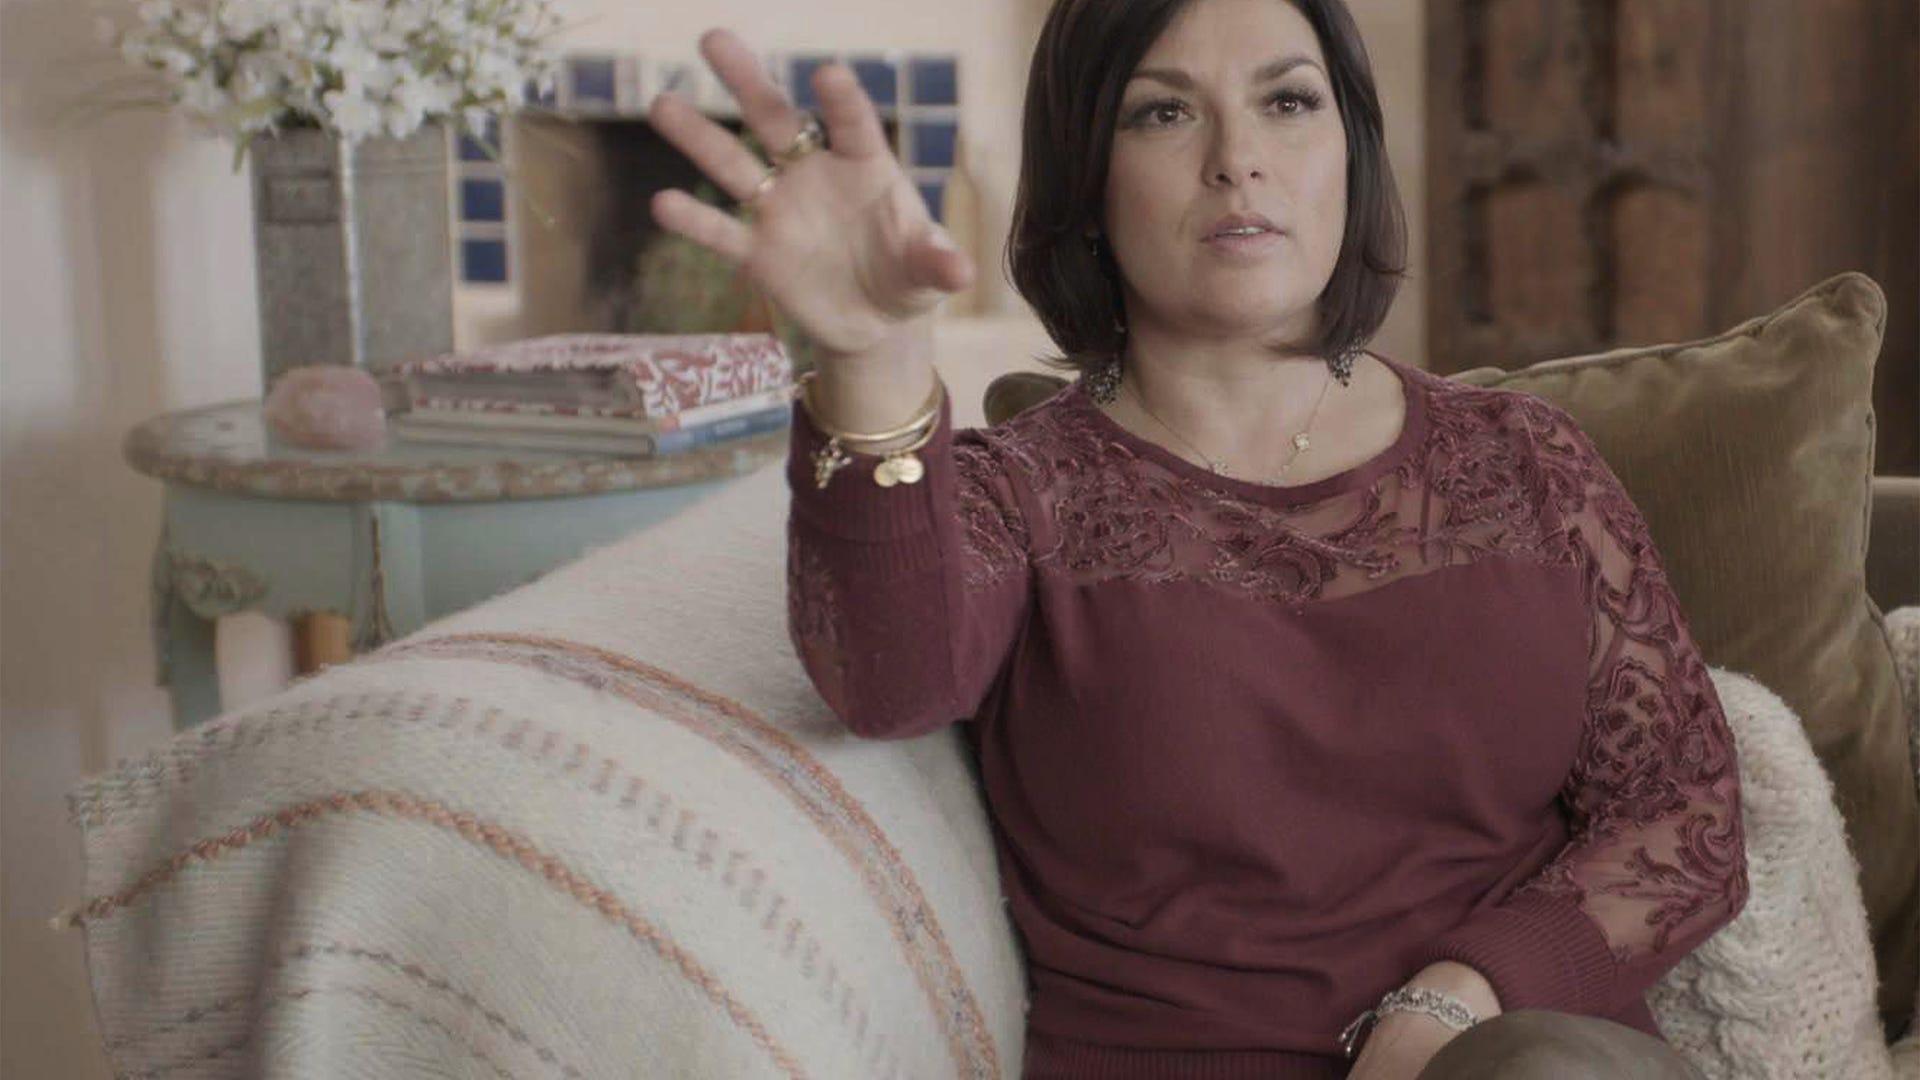 Rachel Benavidez, Surviving Jeffrey Epstein